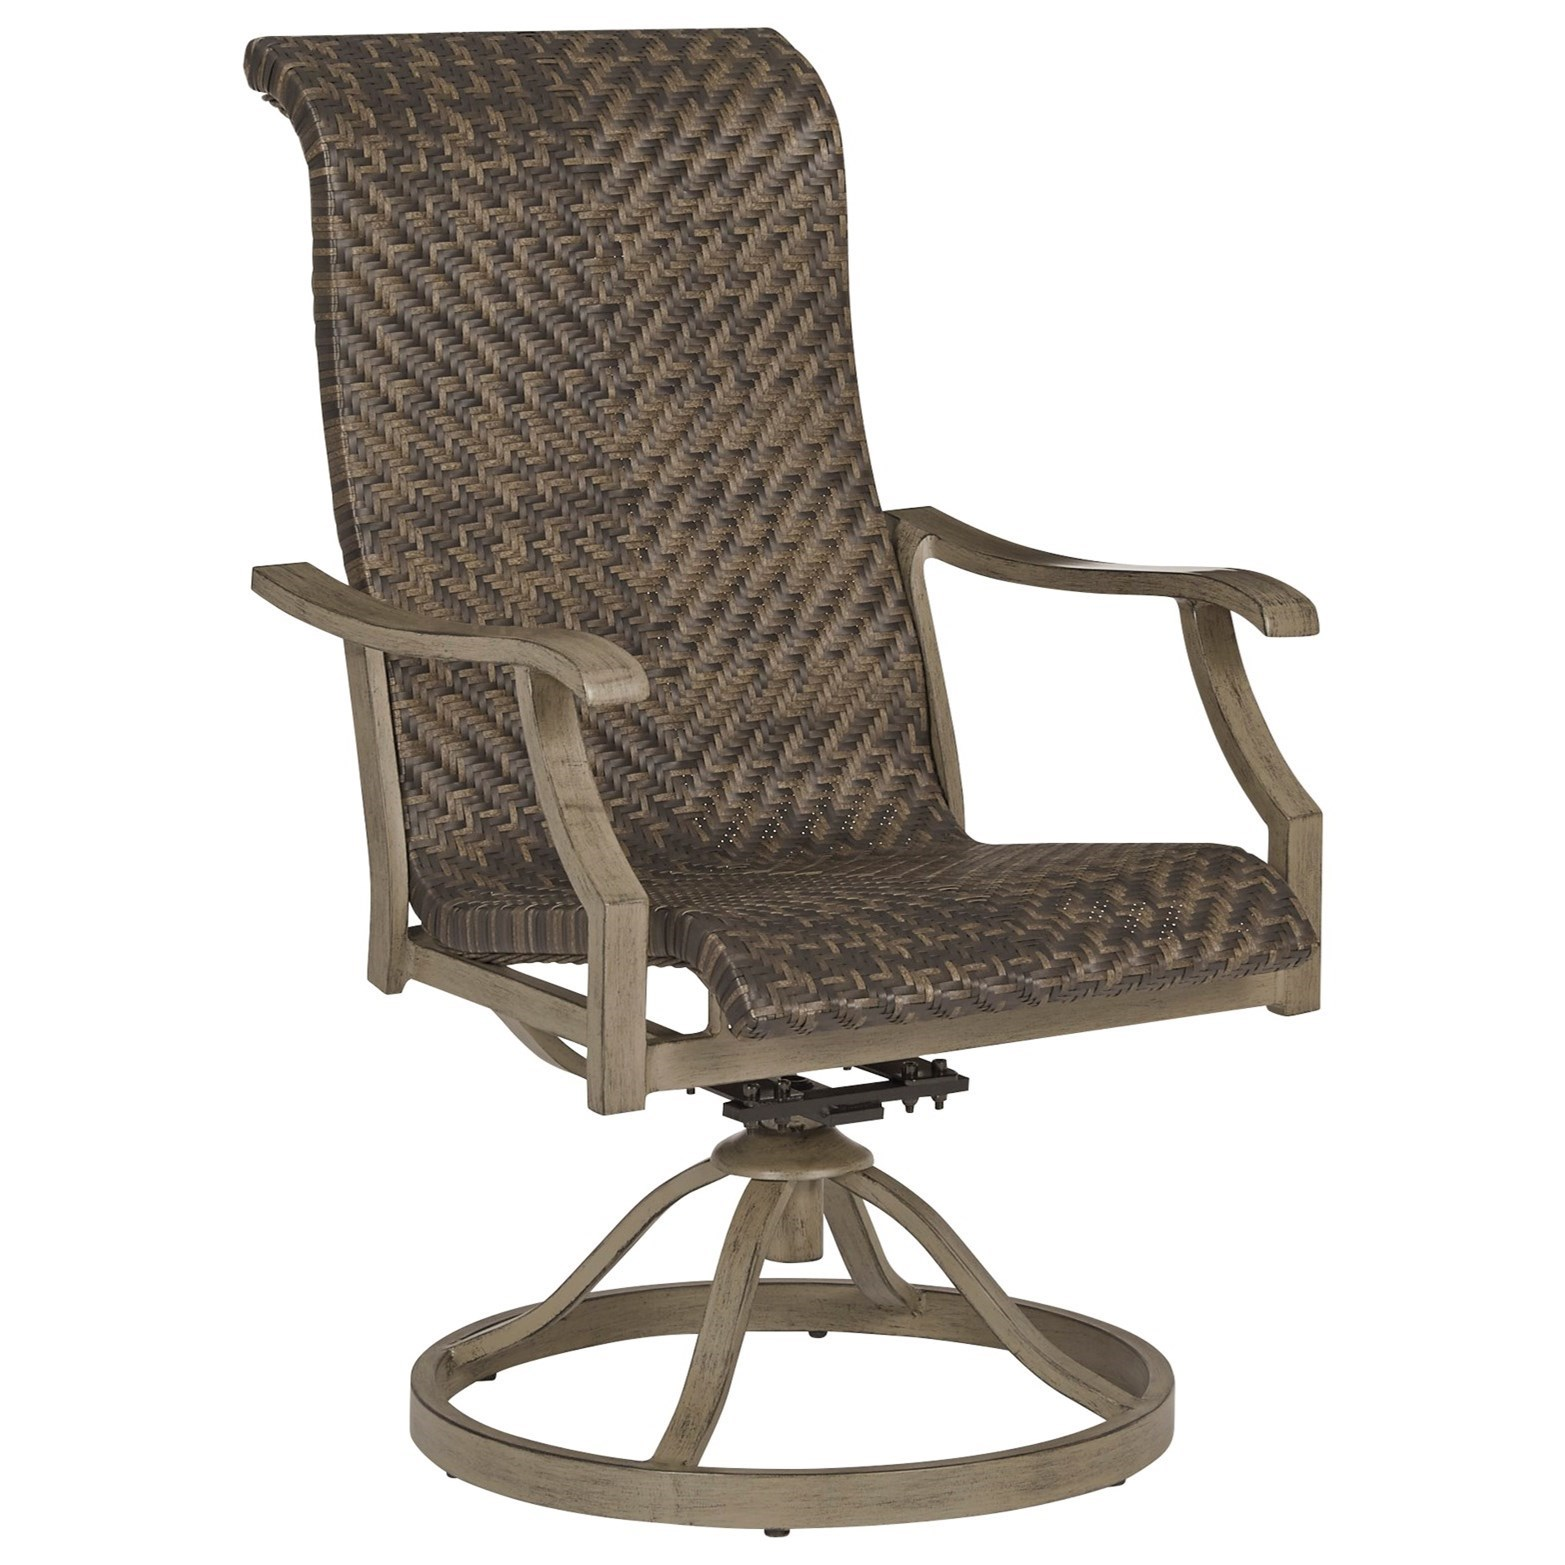 Windon Barn Set of 2 Swivel Chairs by Ashley (Signature Design) at Johnny Janosik